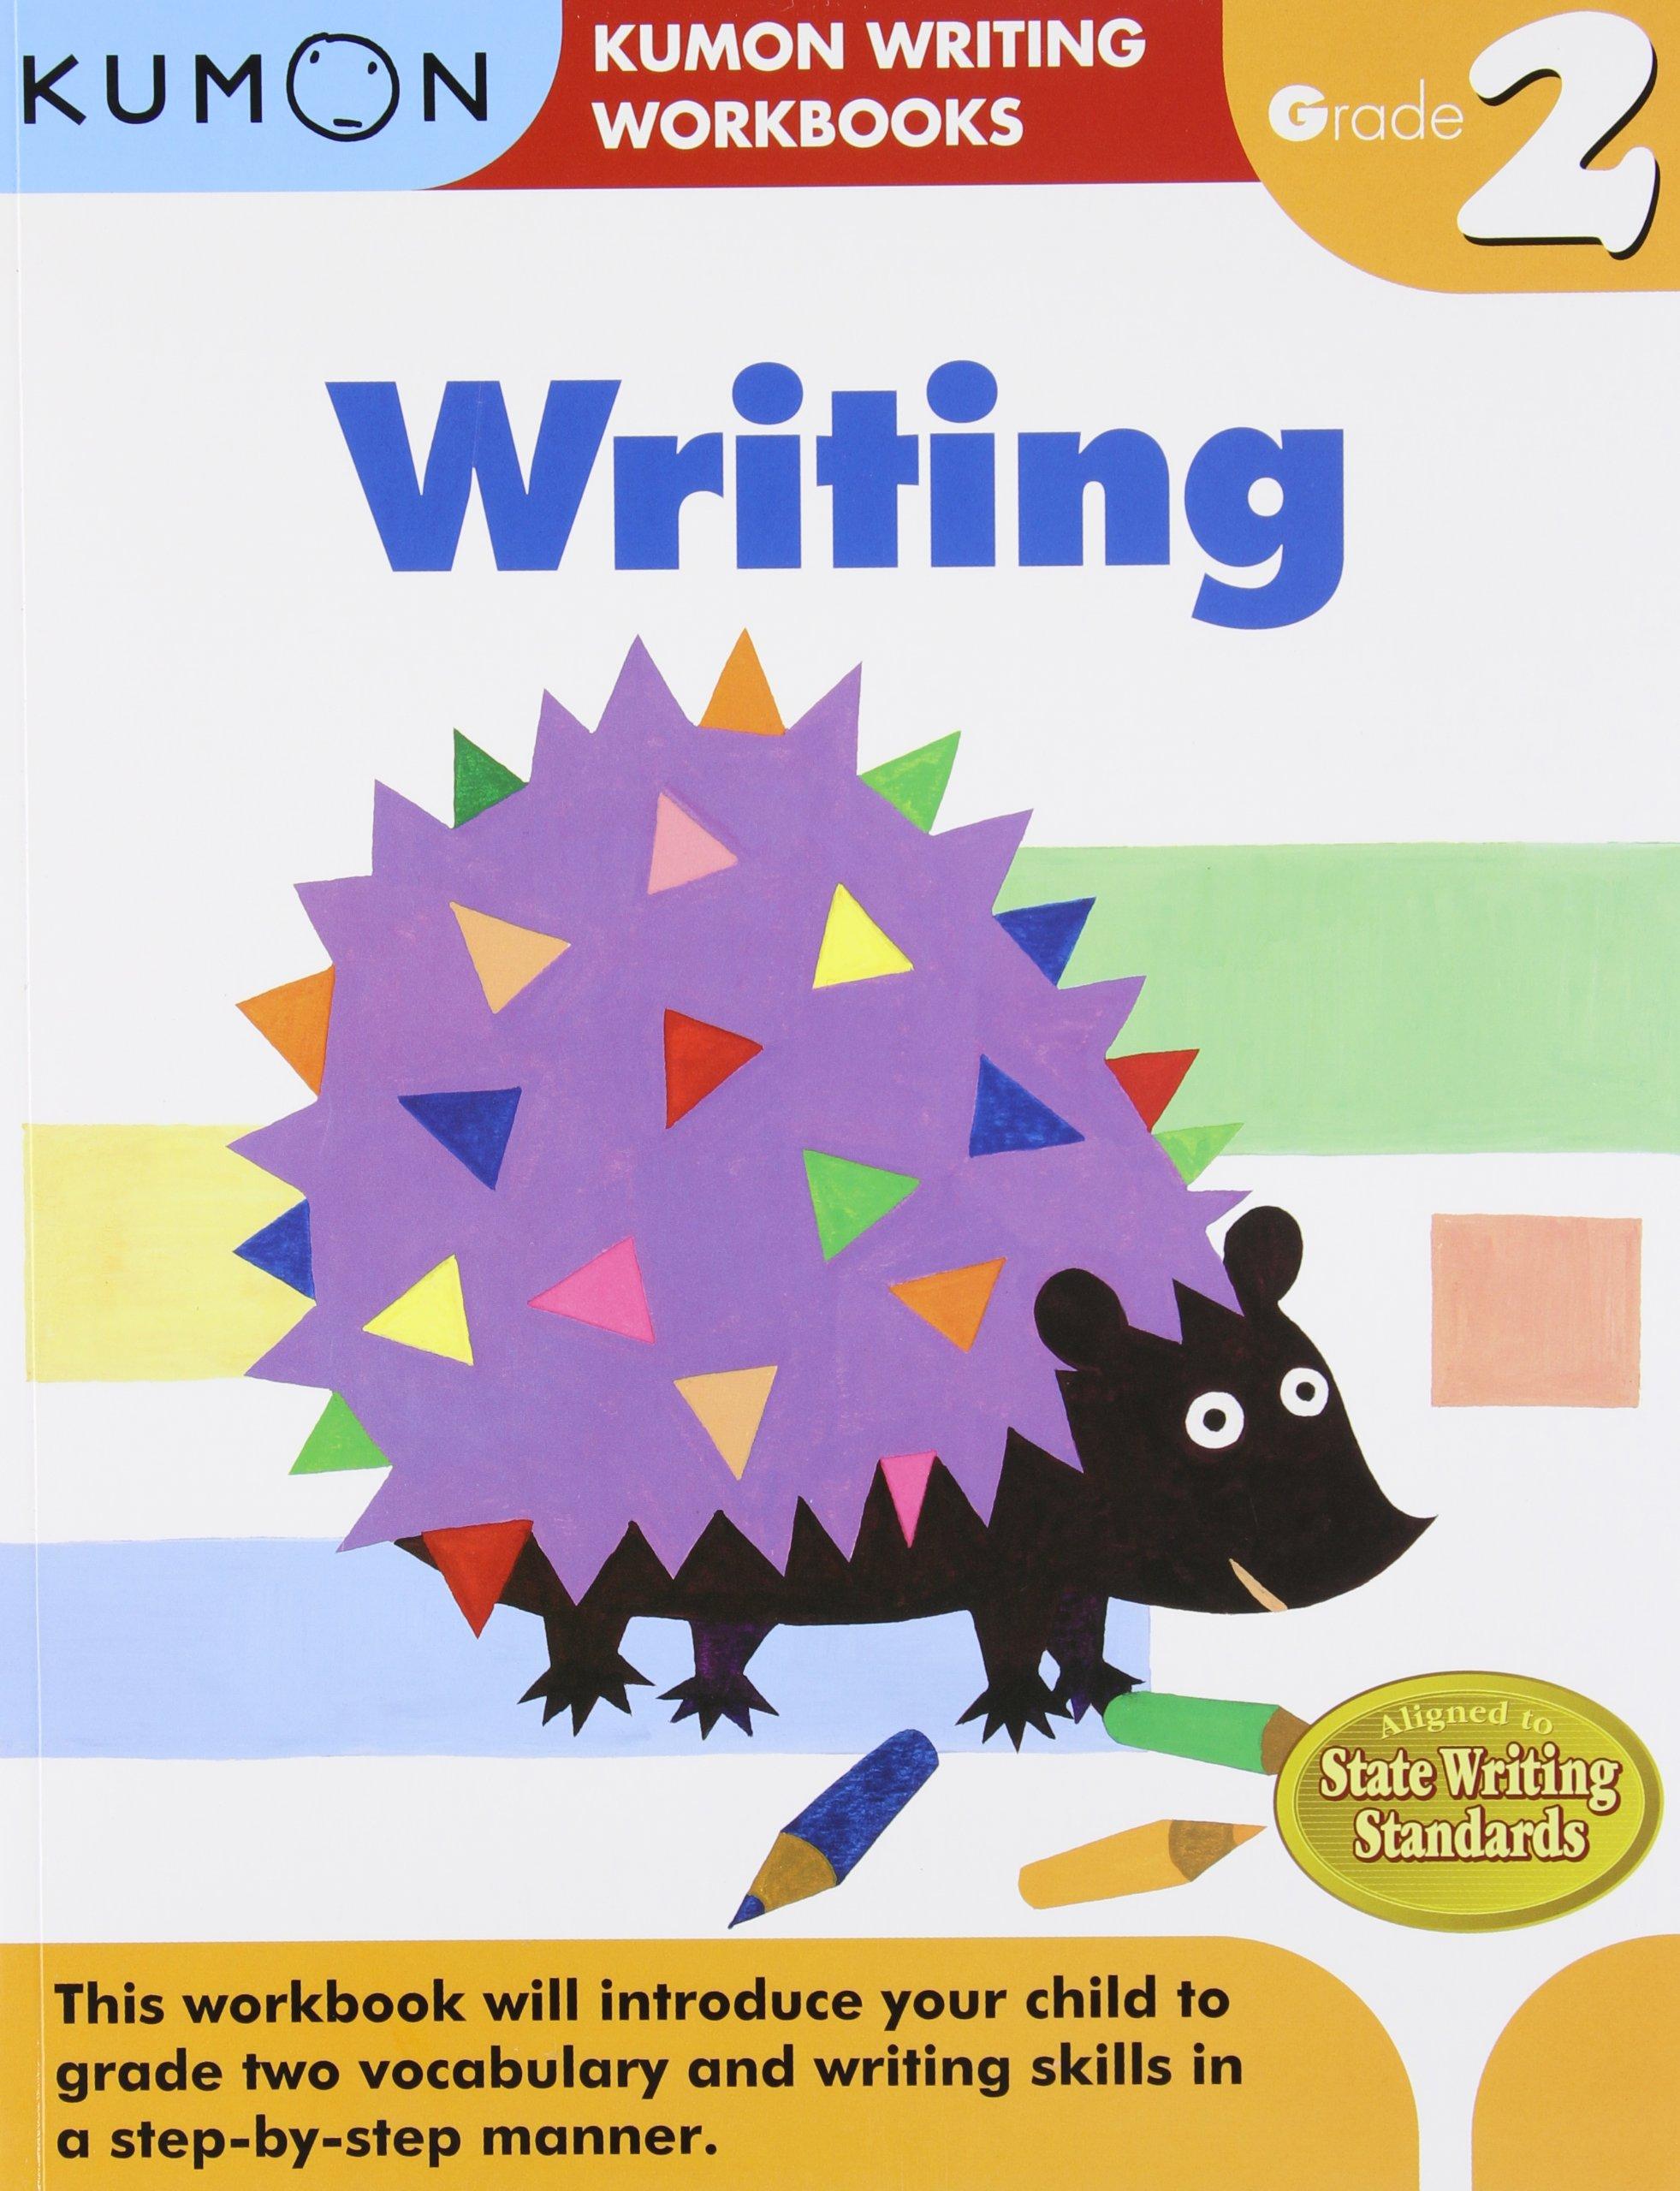 Free Worksheet Kumon Worksheets For Sale buy word problems grade 2 kumon math workbooks book online at writing workbooks